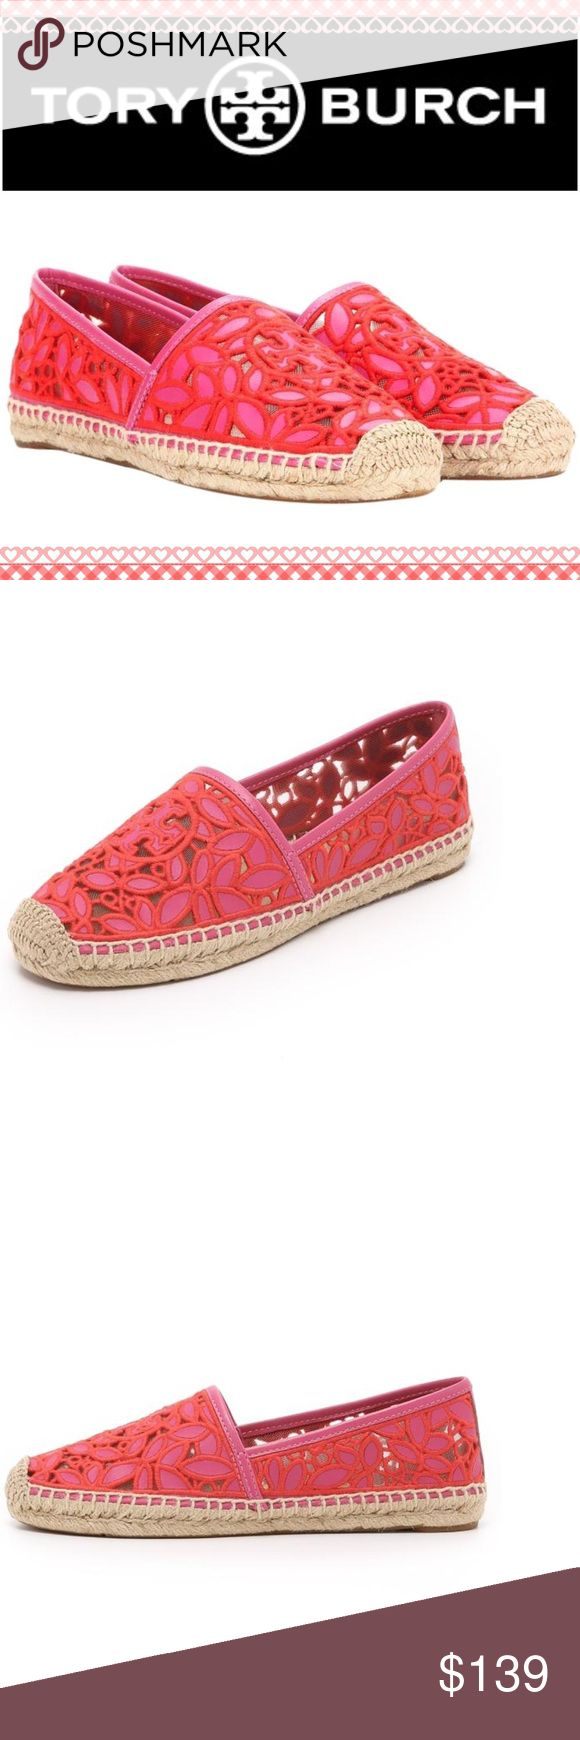 Lace Tory Burch Espadrilles New in box beautiful Red/pink Espadrilles. Make an offer Tory Burch Shoes Espadrilles